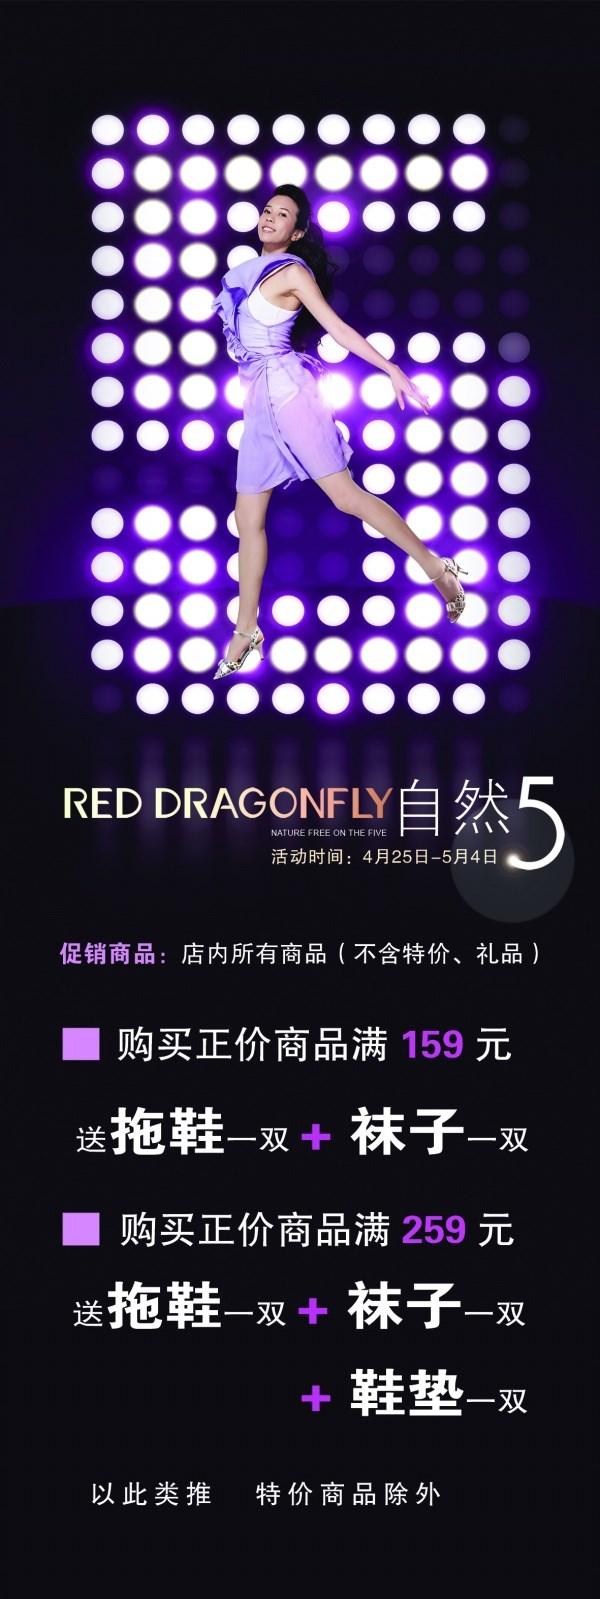 Campaign banner PSD design